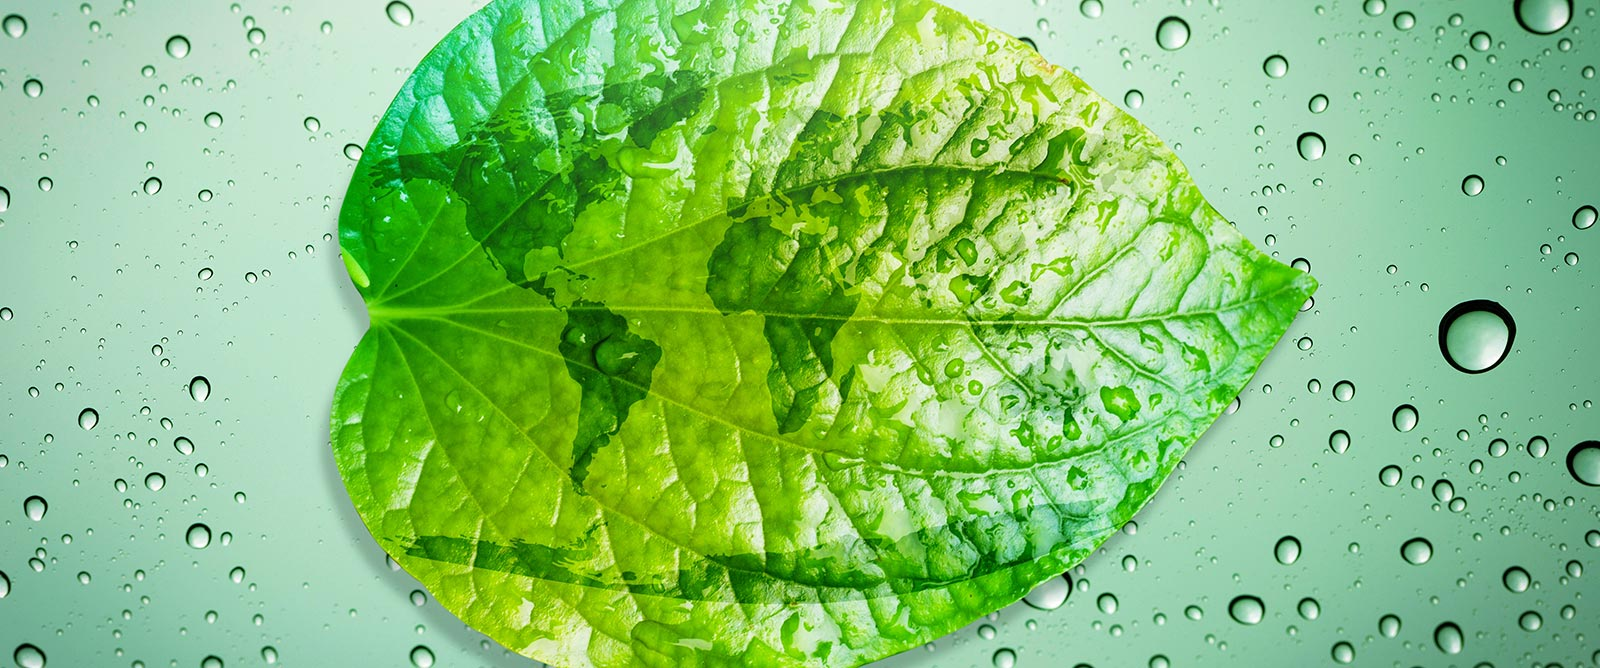 AGC Nederland - Duurzaamheidsverslag 2018